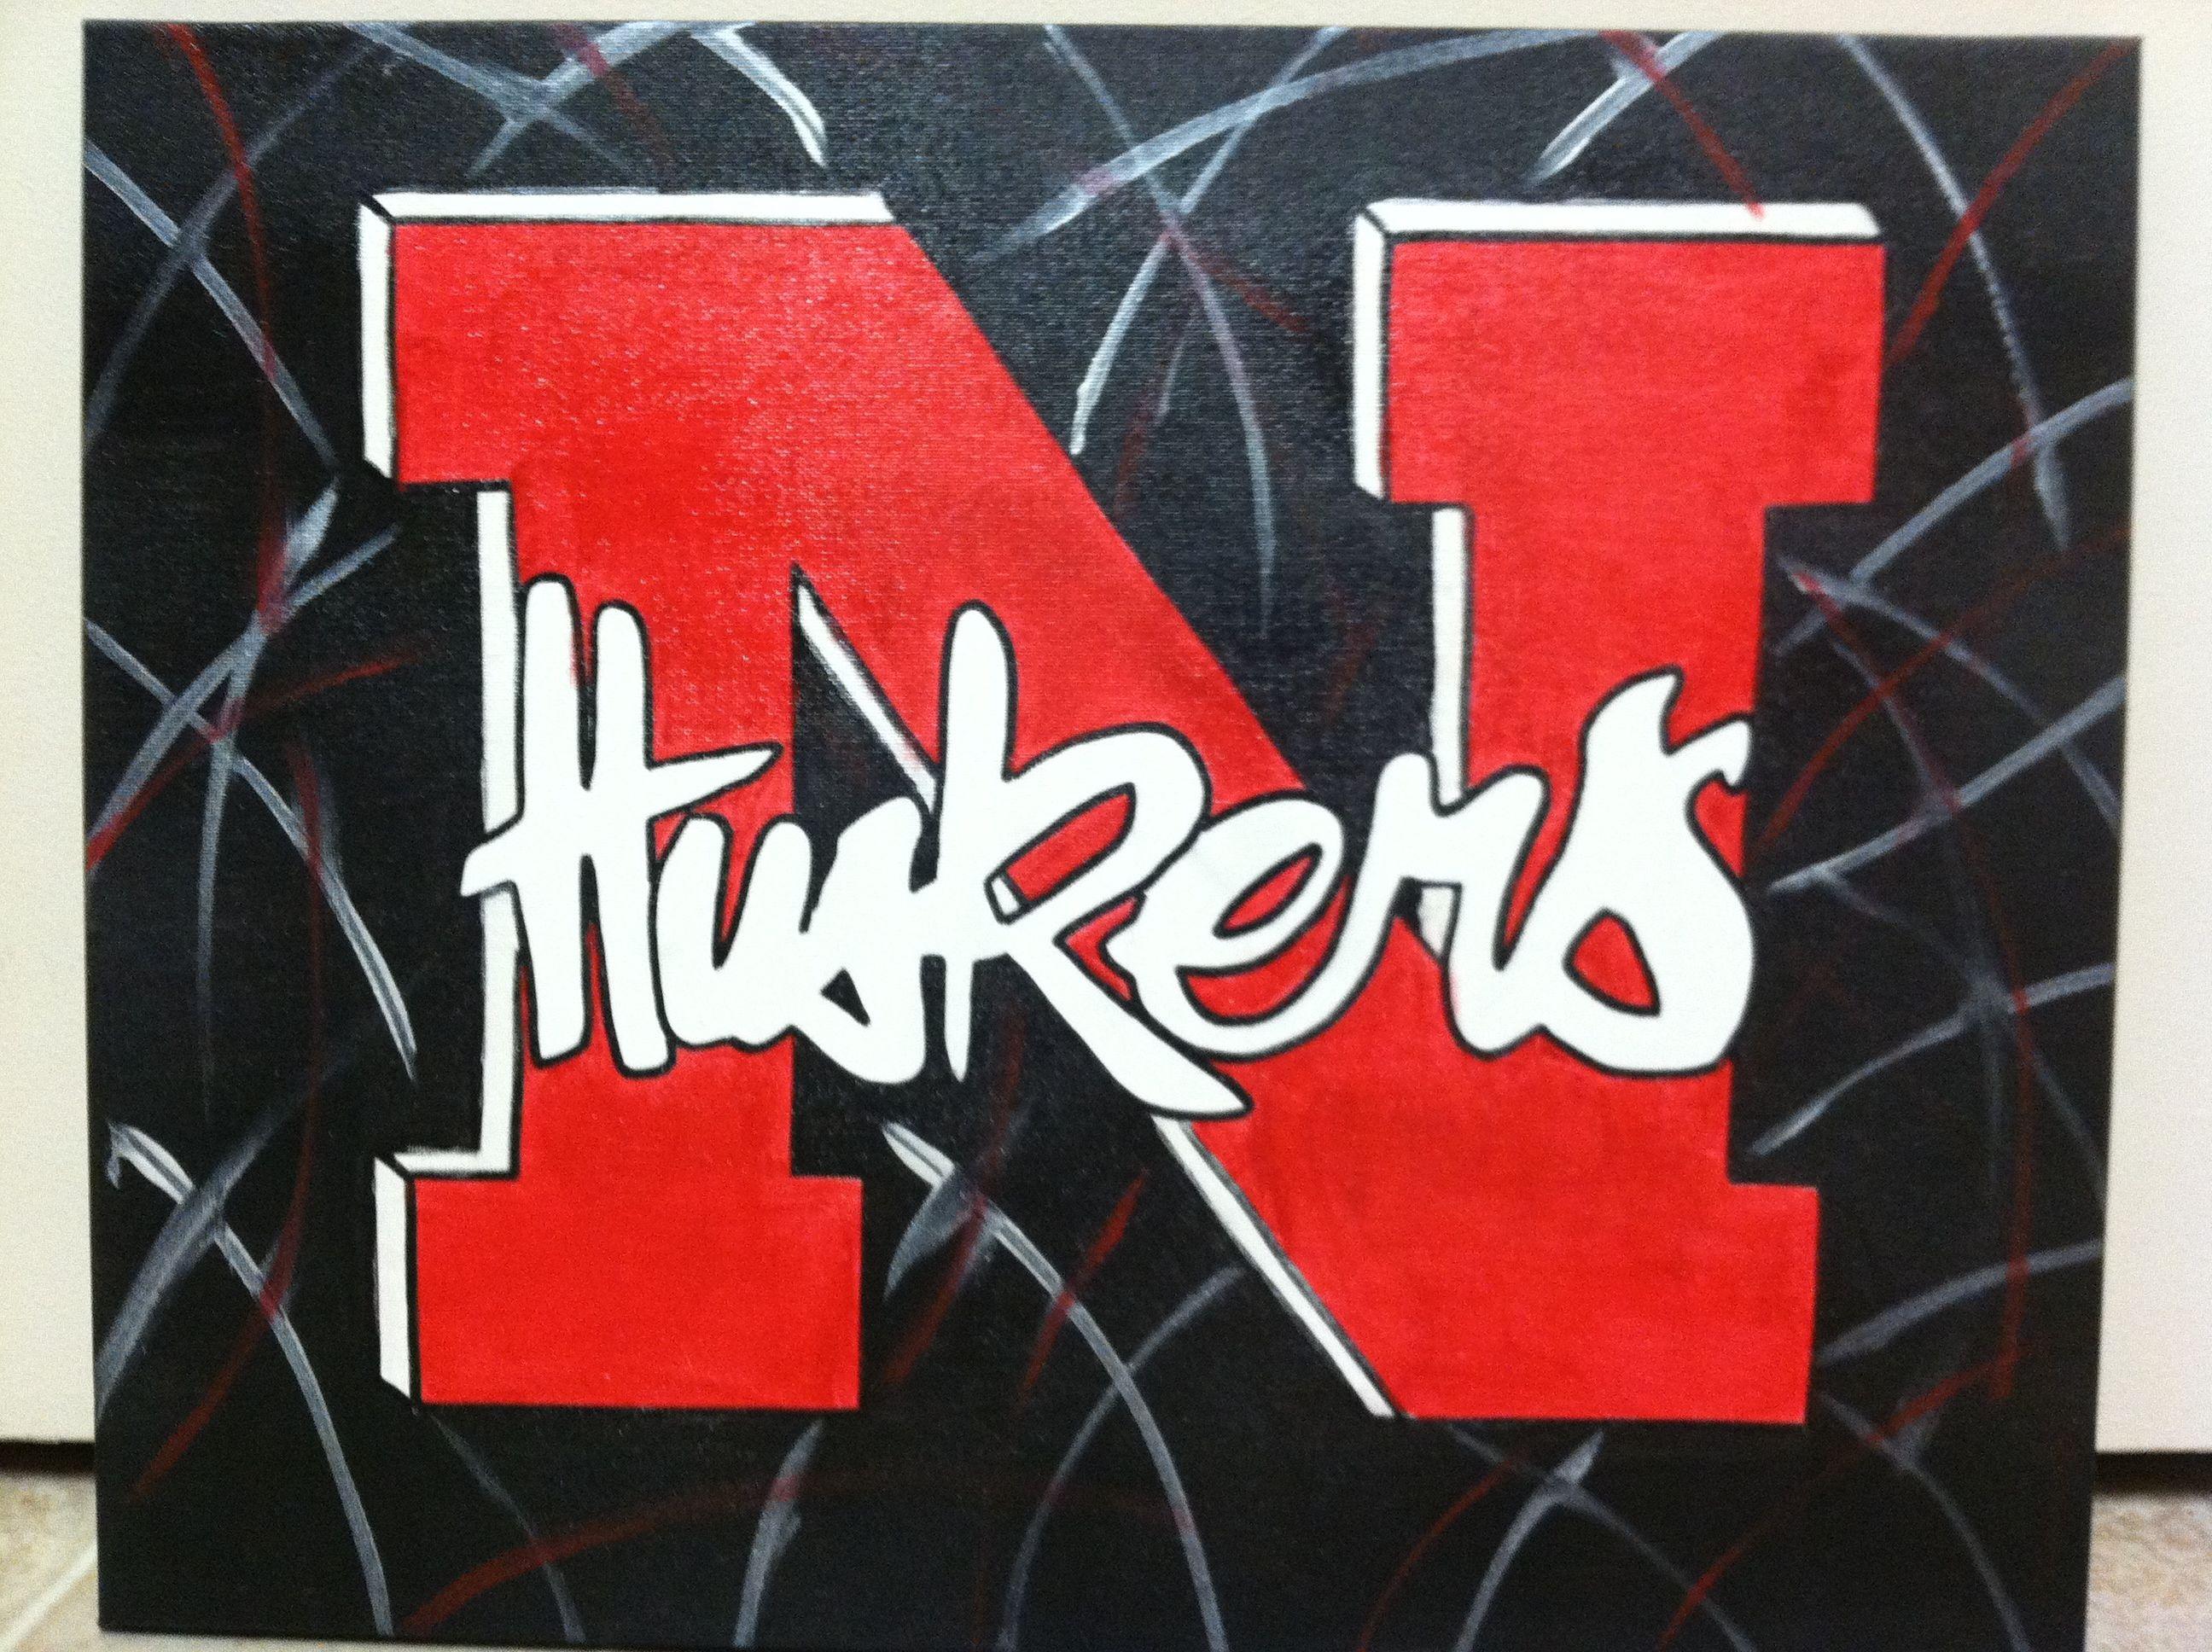 Husker Canvas Husker Husker Football Nebraska Huskers